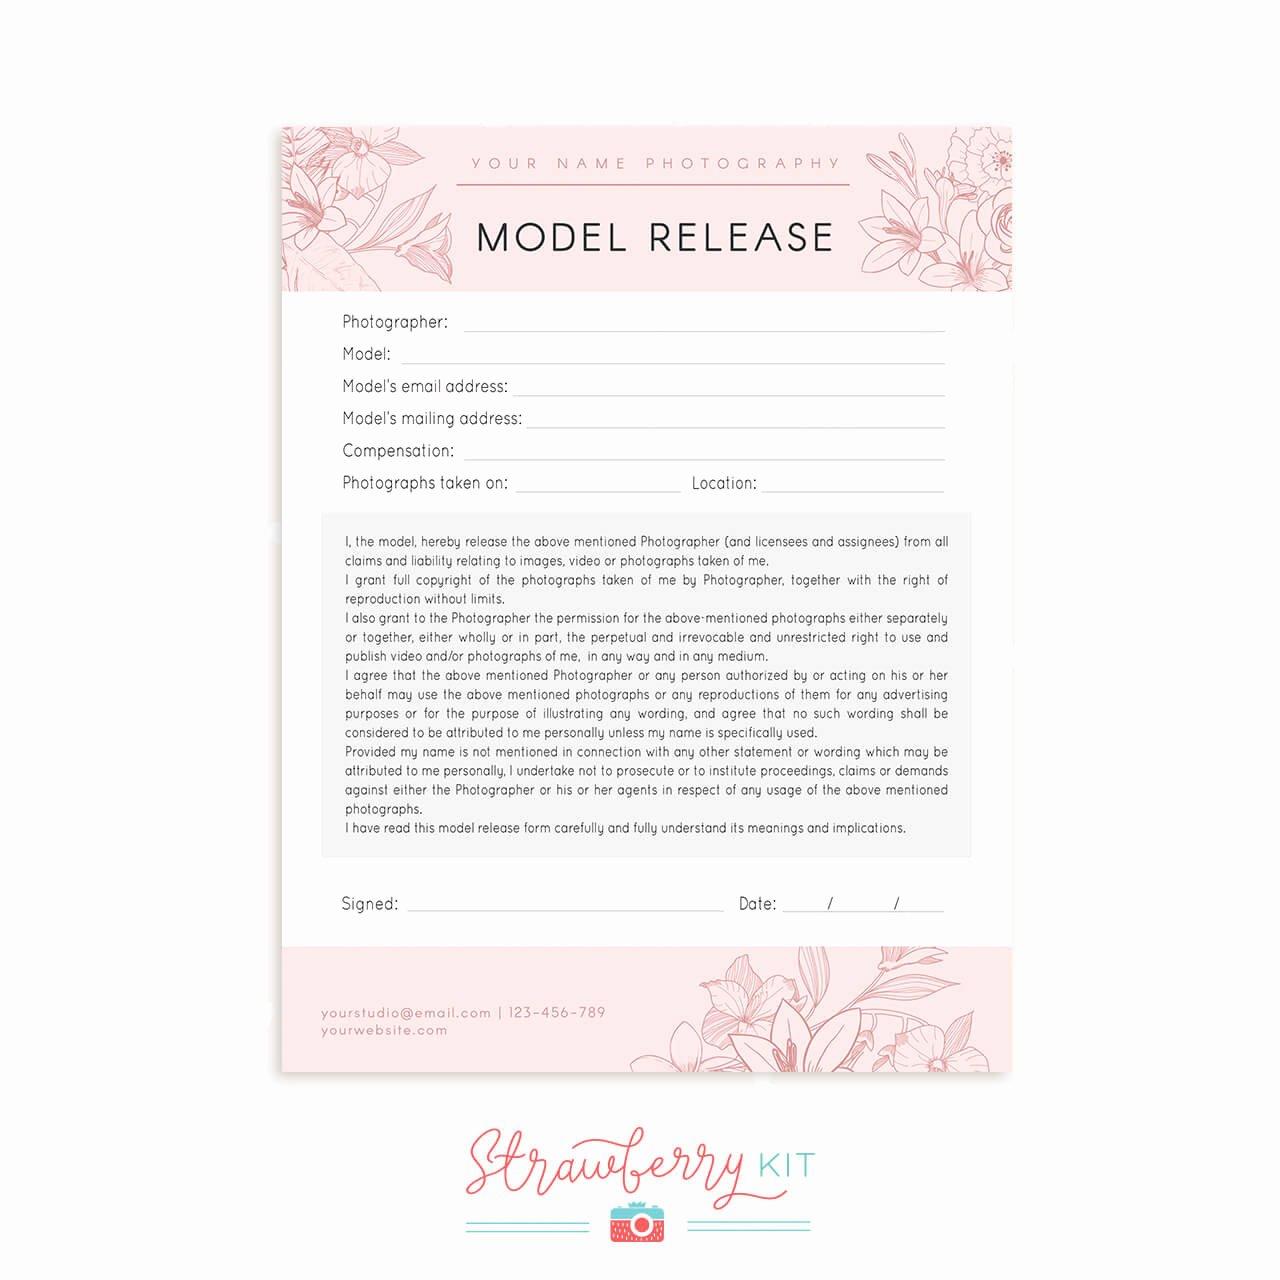 Model Release form Template Best Of Model Release form Floral Strawberry Kit